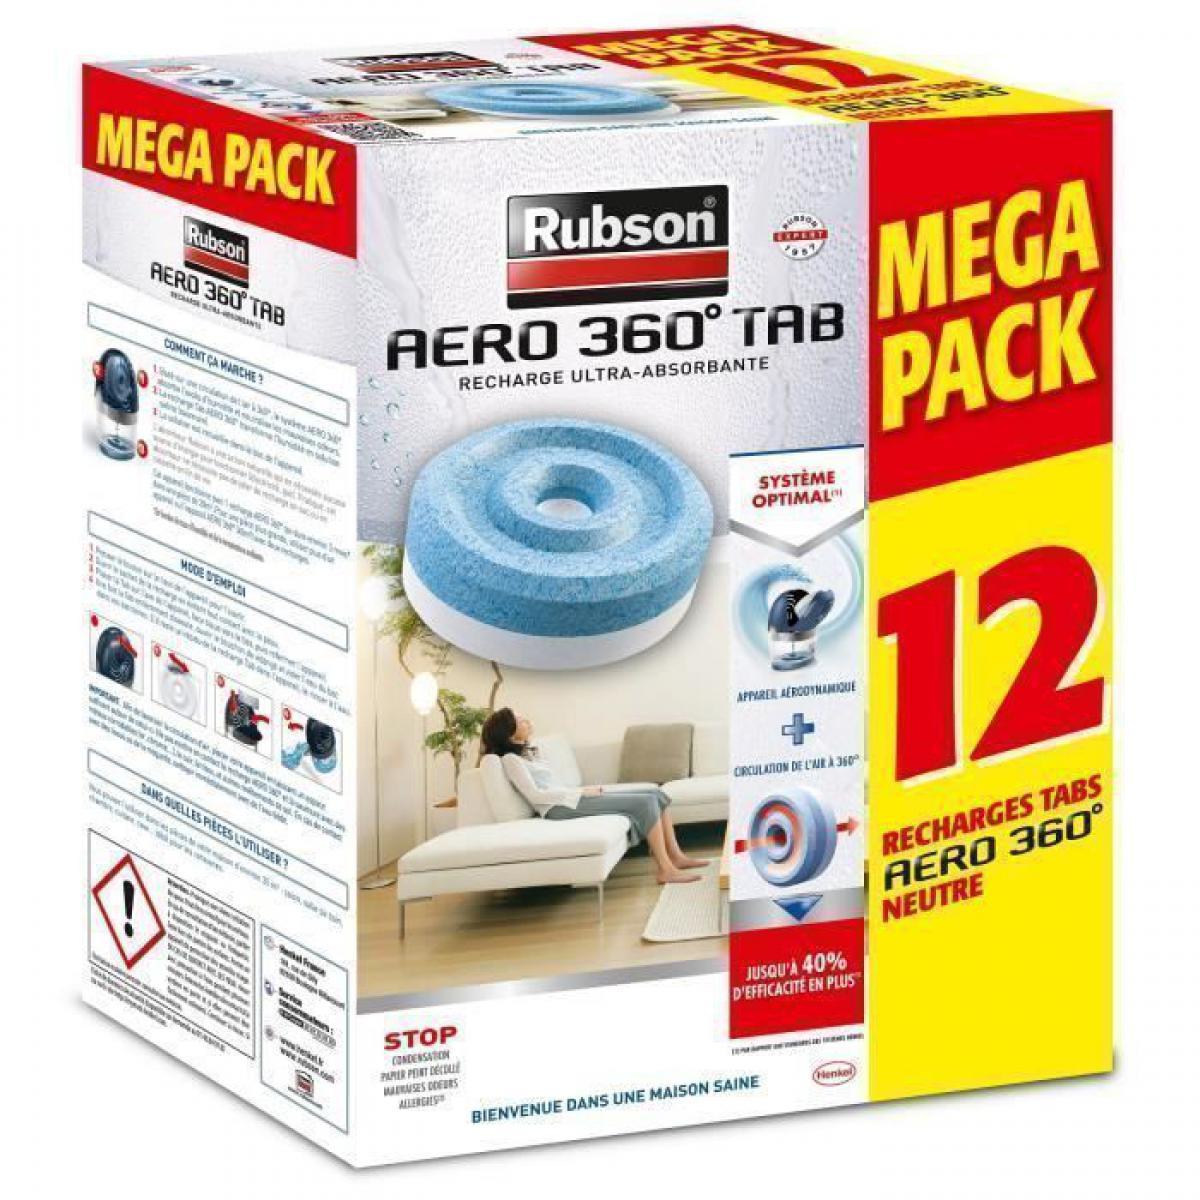 Rubson RUBSON PROMO MEGA PACK Lot de 12 recharge Aero 360 Neutre